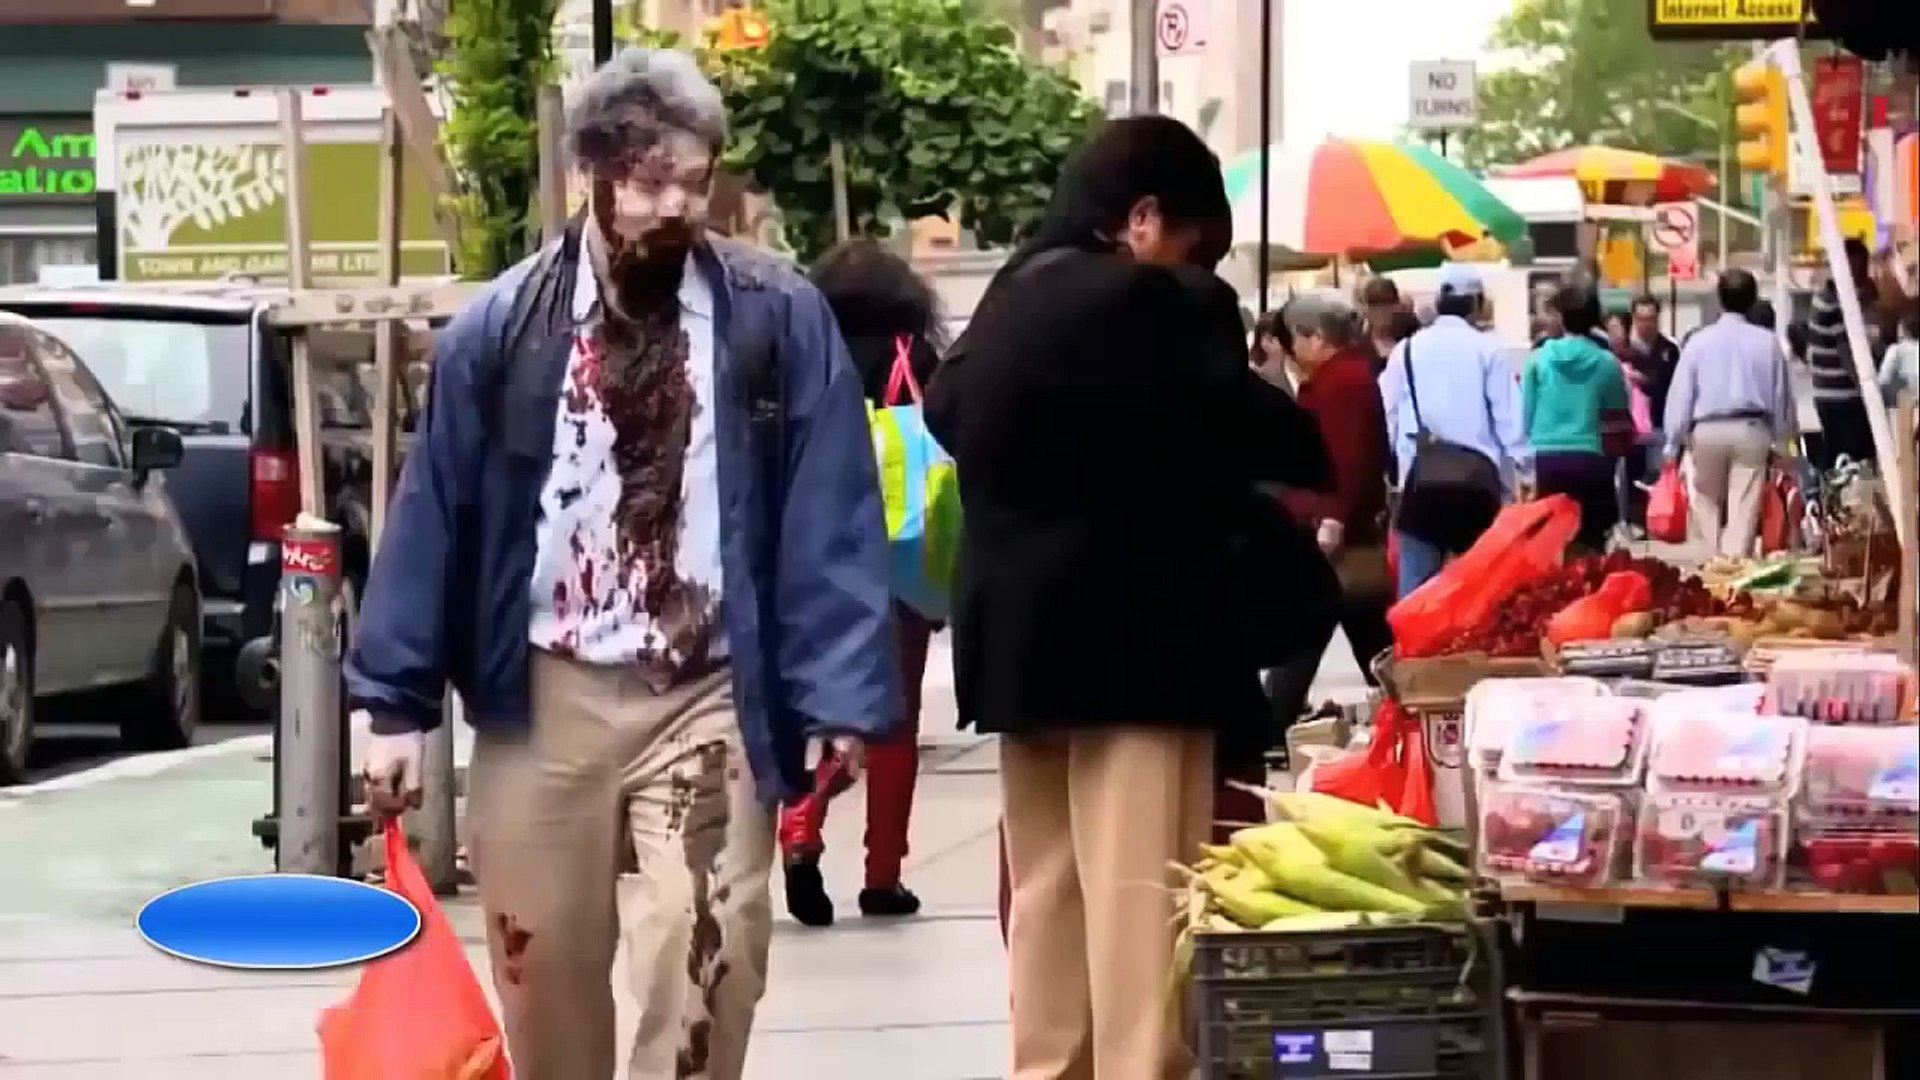 Funny Pranks - funny pranks, funny pranks on people